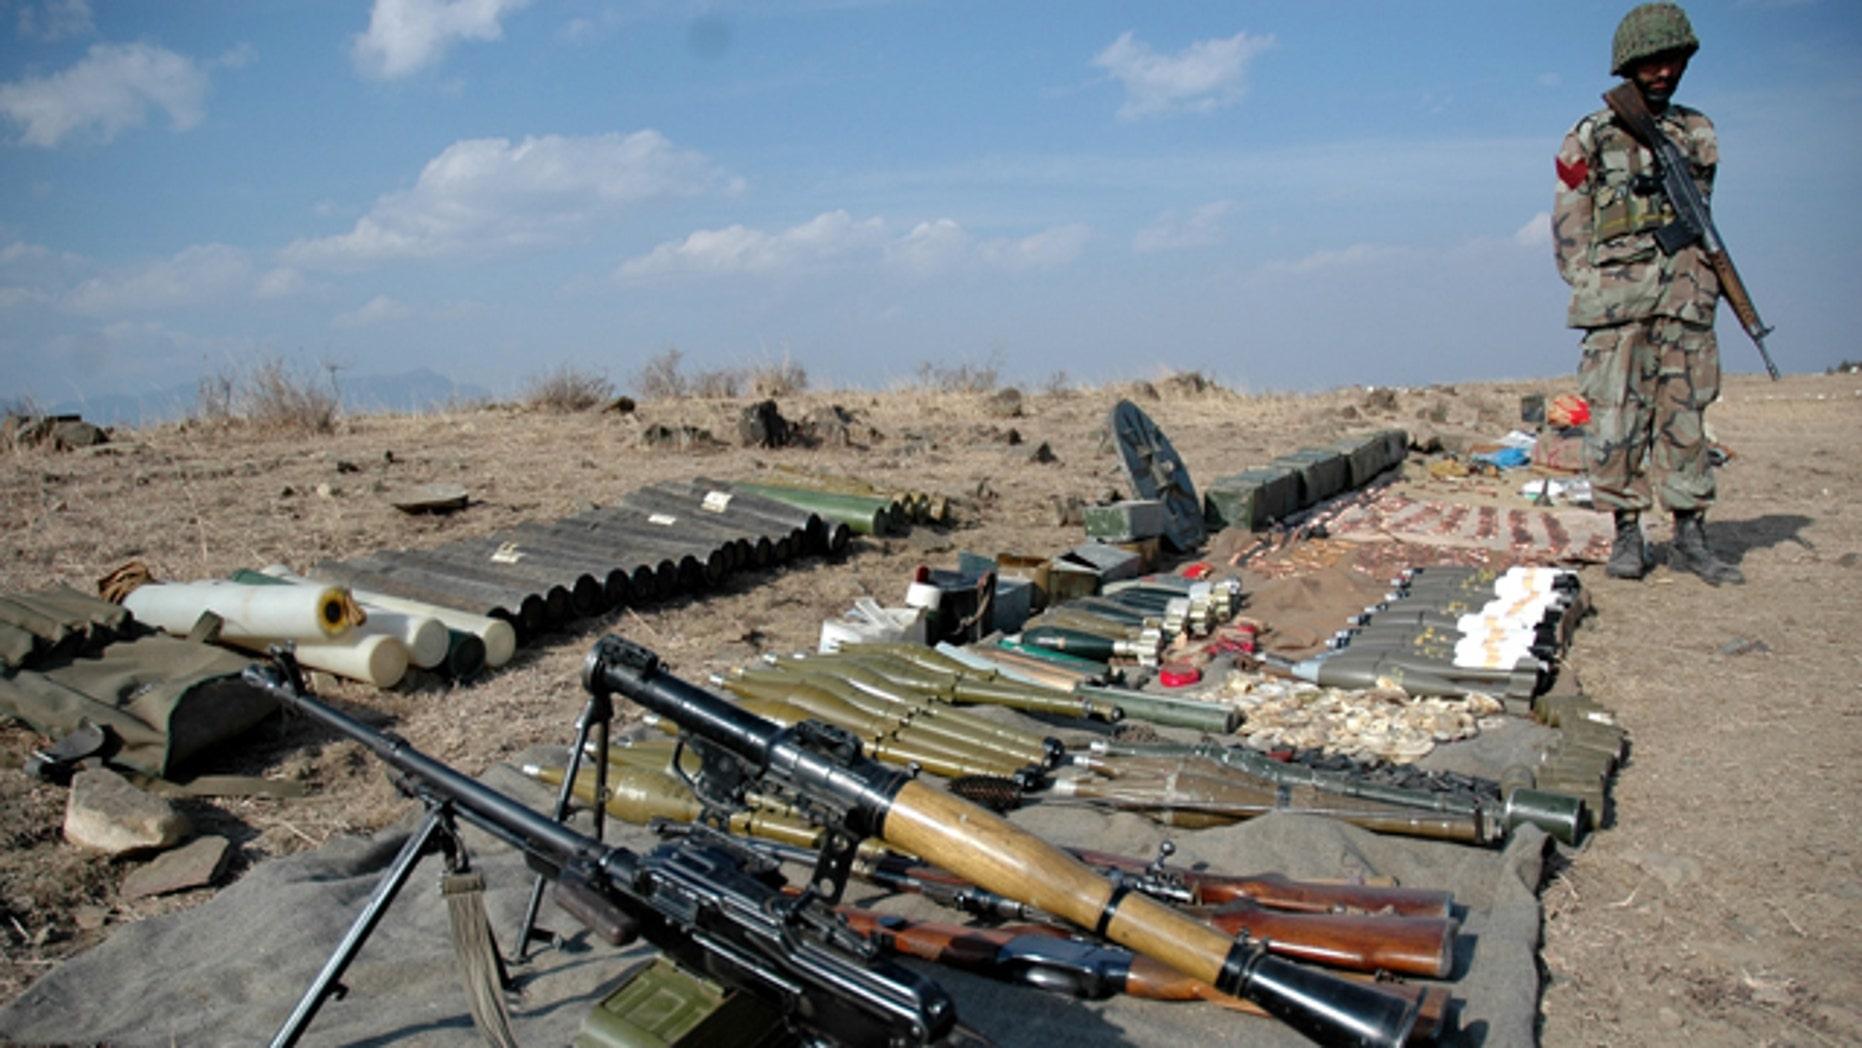 Pakistan army soldier stands next to ammunition seized from militants in Wana of Pakistani tribal region of Waziristan.